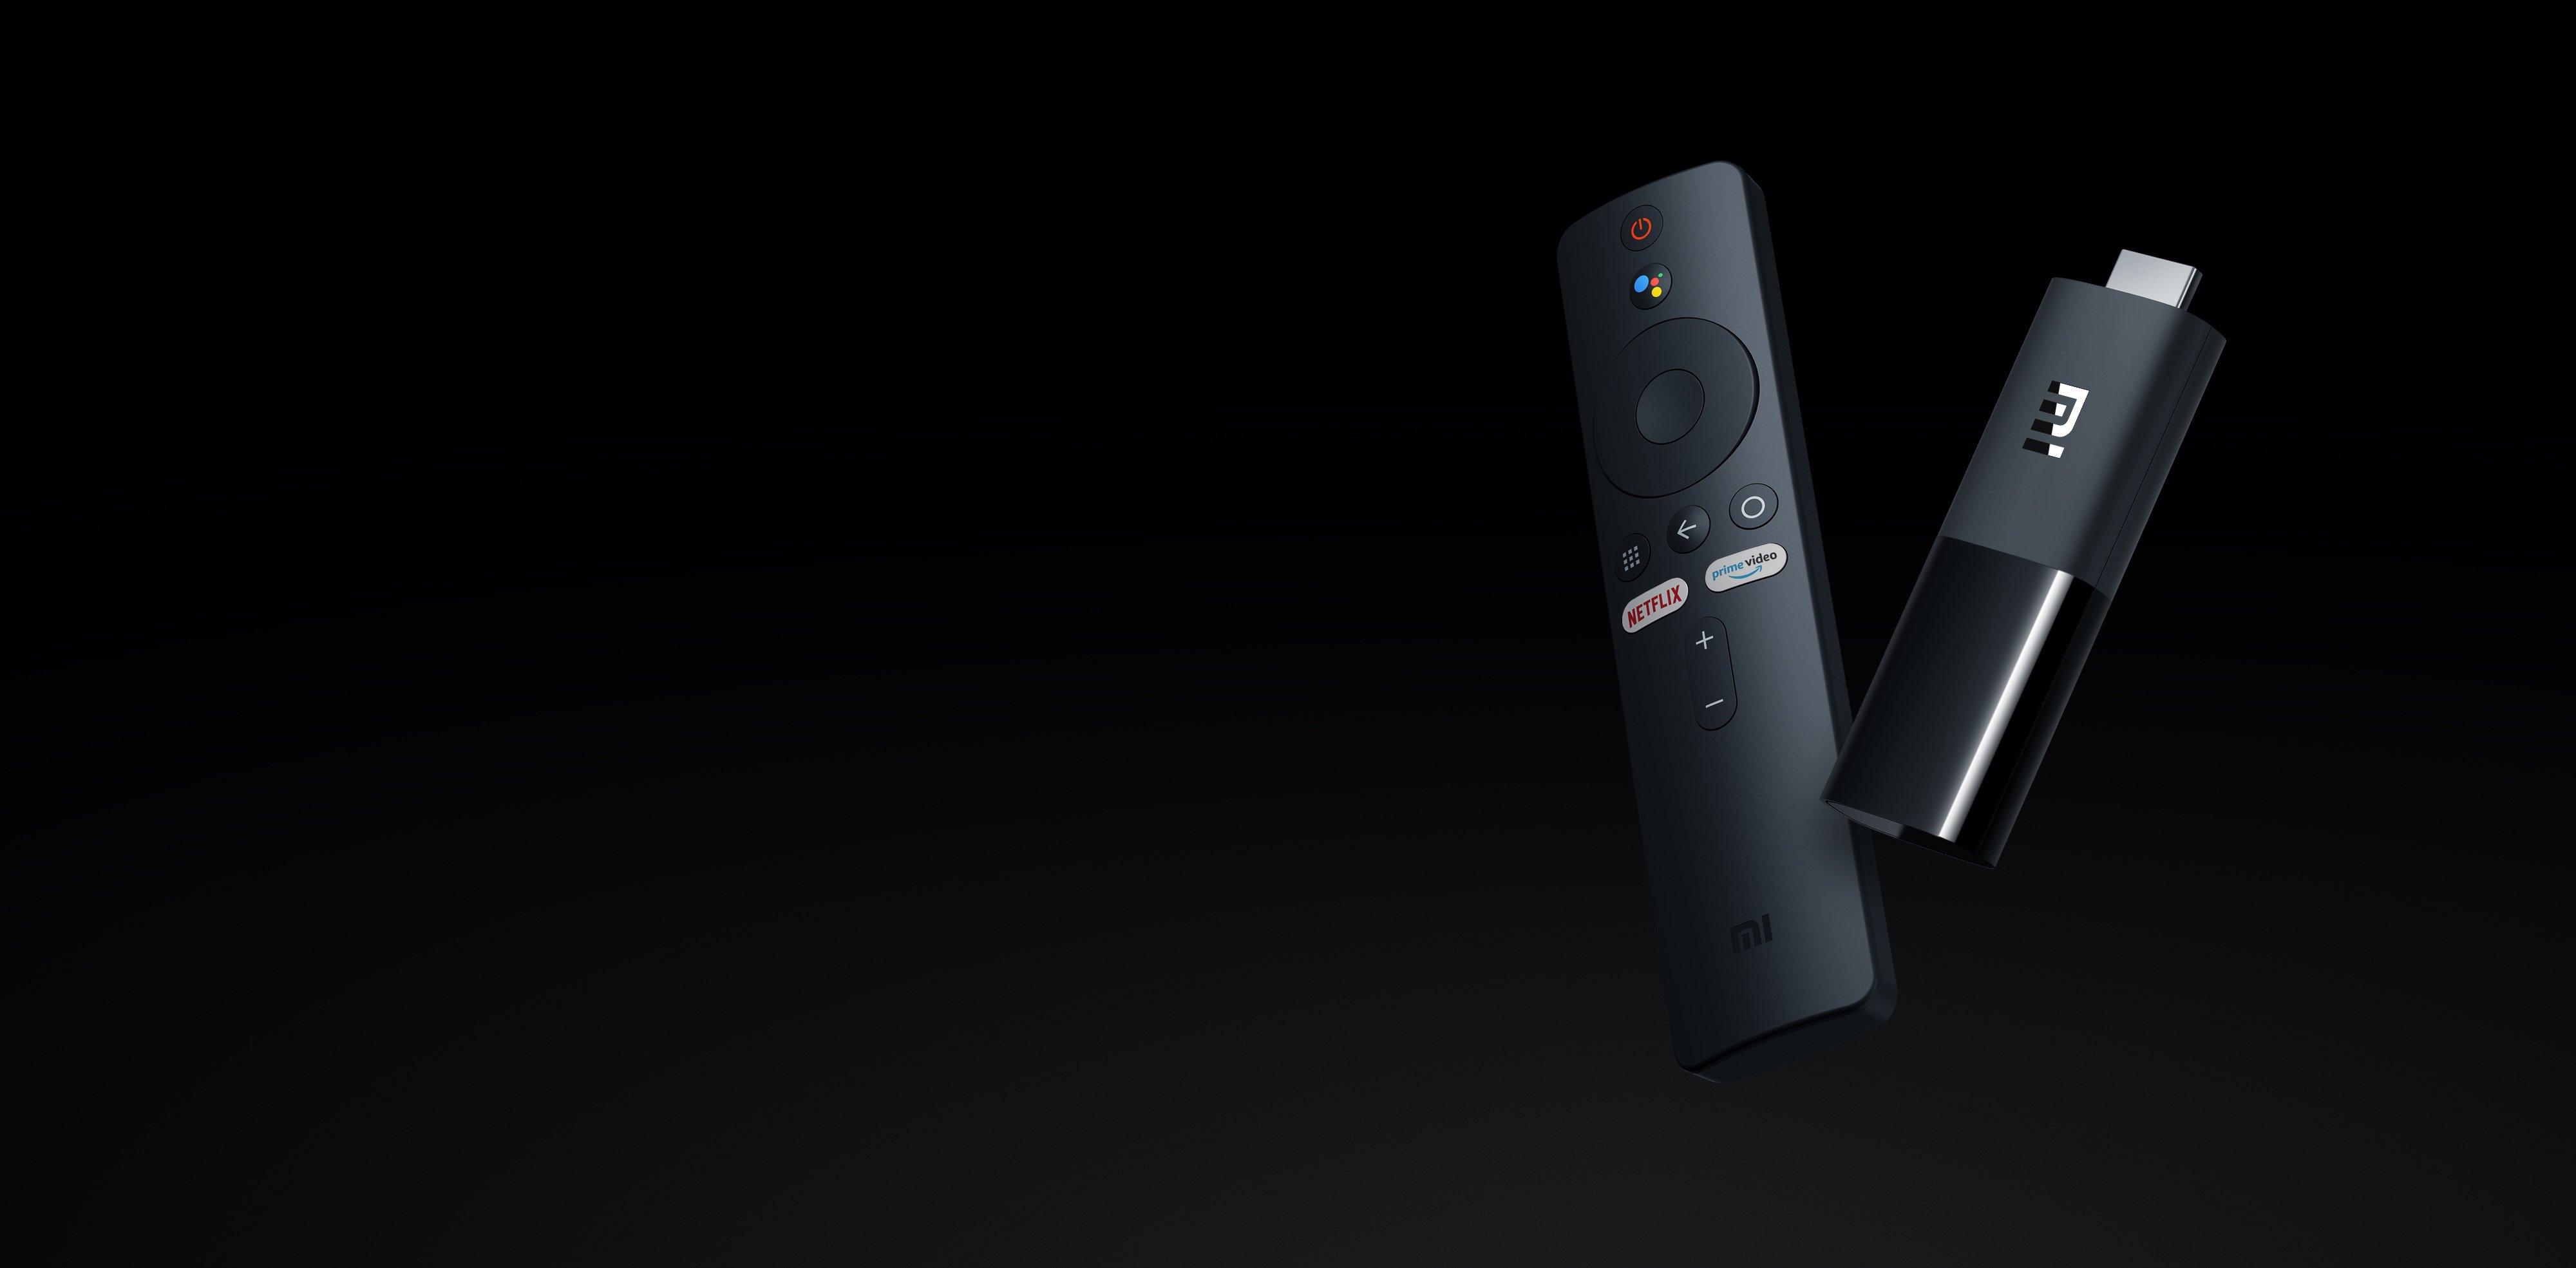 Mi TV Stick, la sfida di Xiaomi a Fire TV Stick e Chromecast